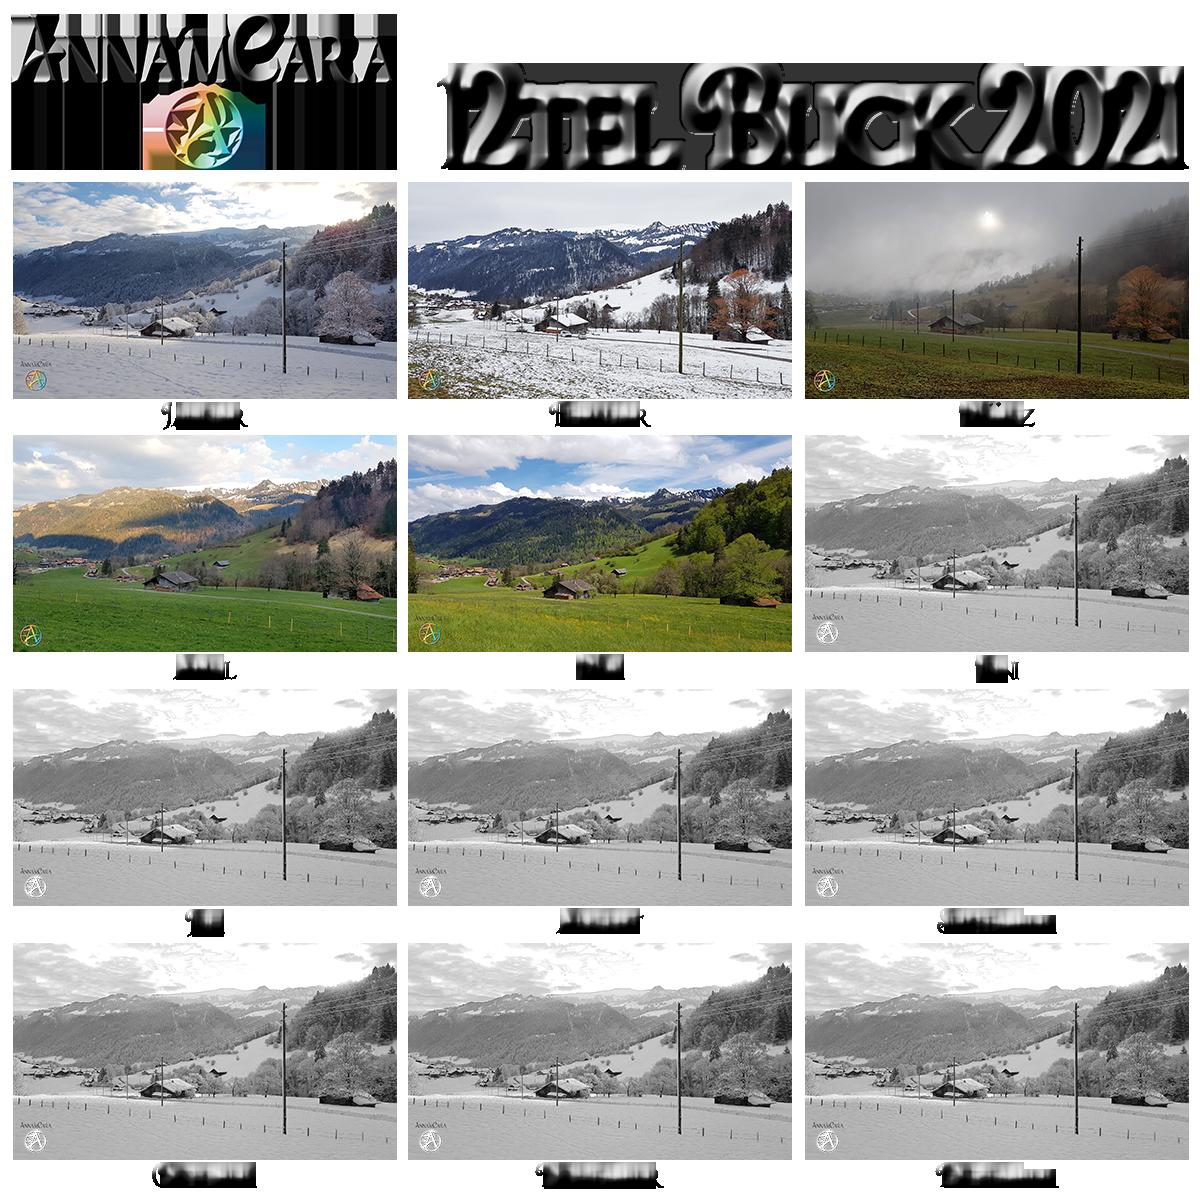 Anna'mCara-Blog - 12tel-Blick - Jahresblick - Mai